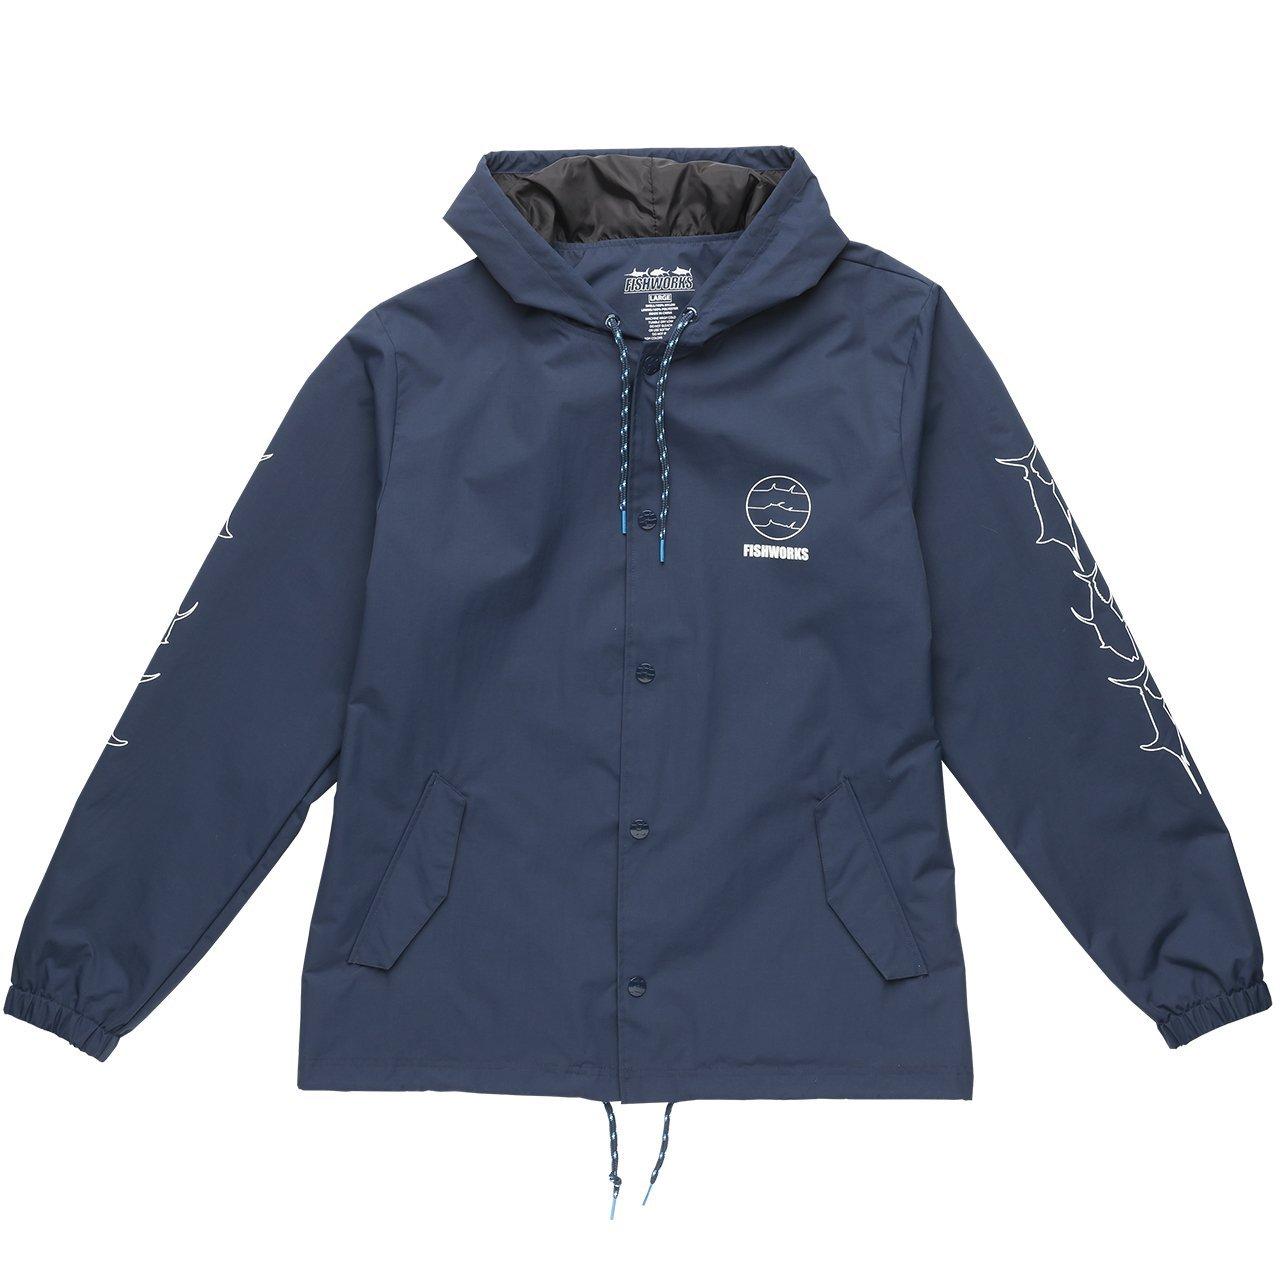 Fishworks Fine Lines Windbreak Hooded Jacket | 100% Durable Nylon with 5,000mm/3,000mm | Taffeta Lined | Windbreaker Fishing Jacket